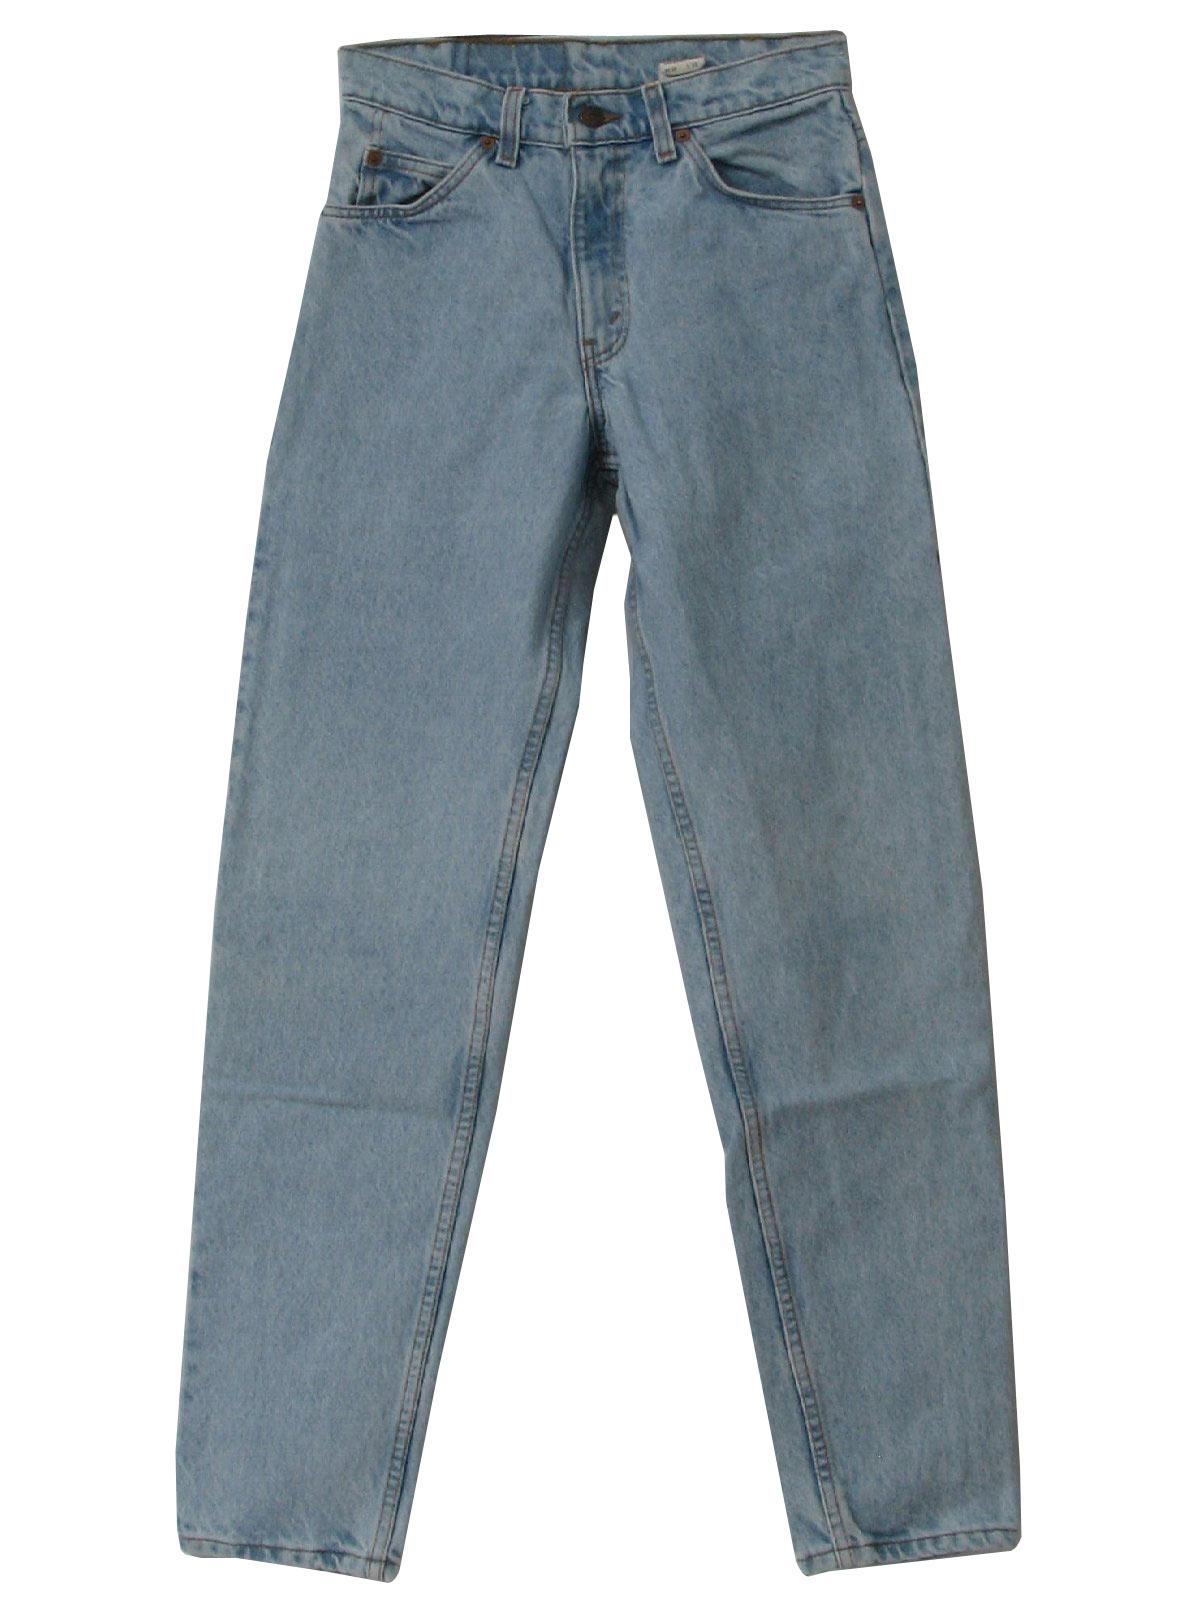 Retro 90u0026#39;s Pants 90s -Levis- Mens blue colored denim cotton tapered leg 550 jeans pants with ...